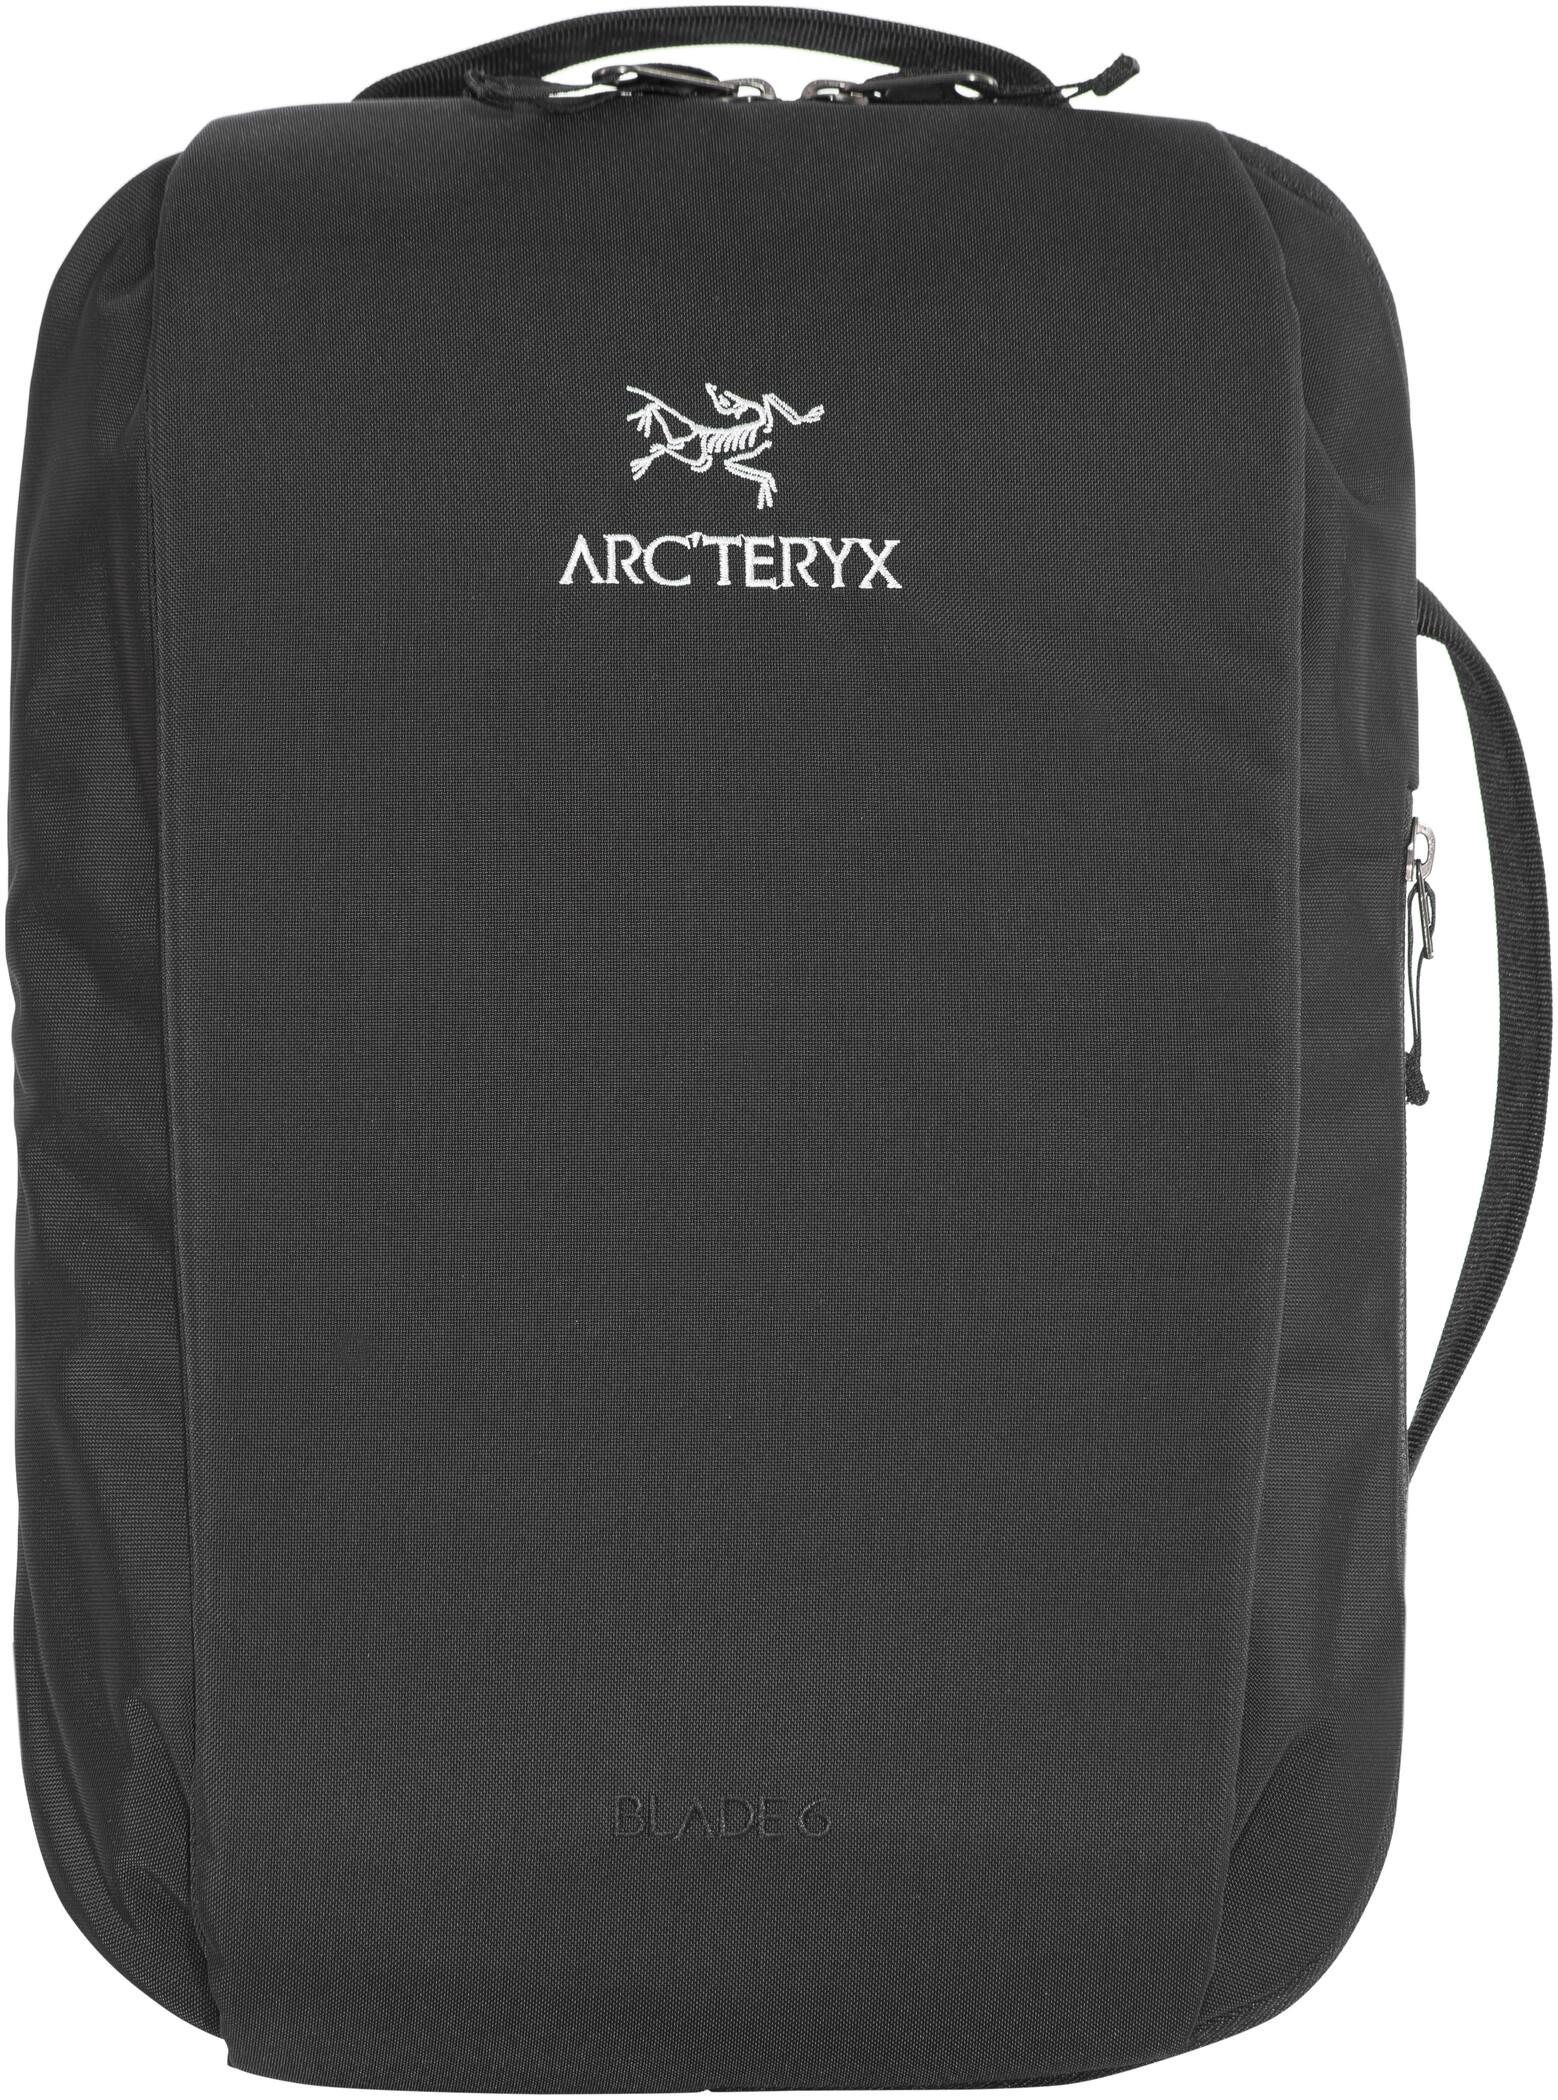 Arc'teryx Blade 6 Rygsæk, black (2019)   Travel bags